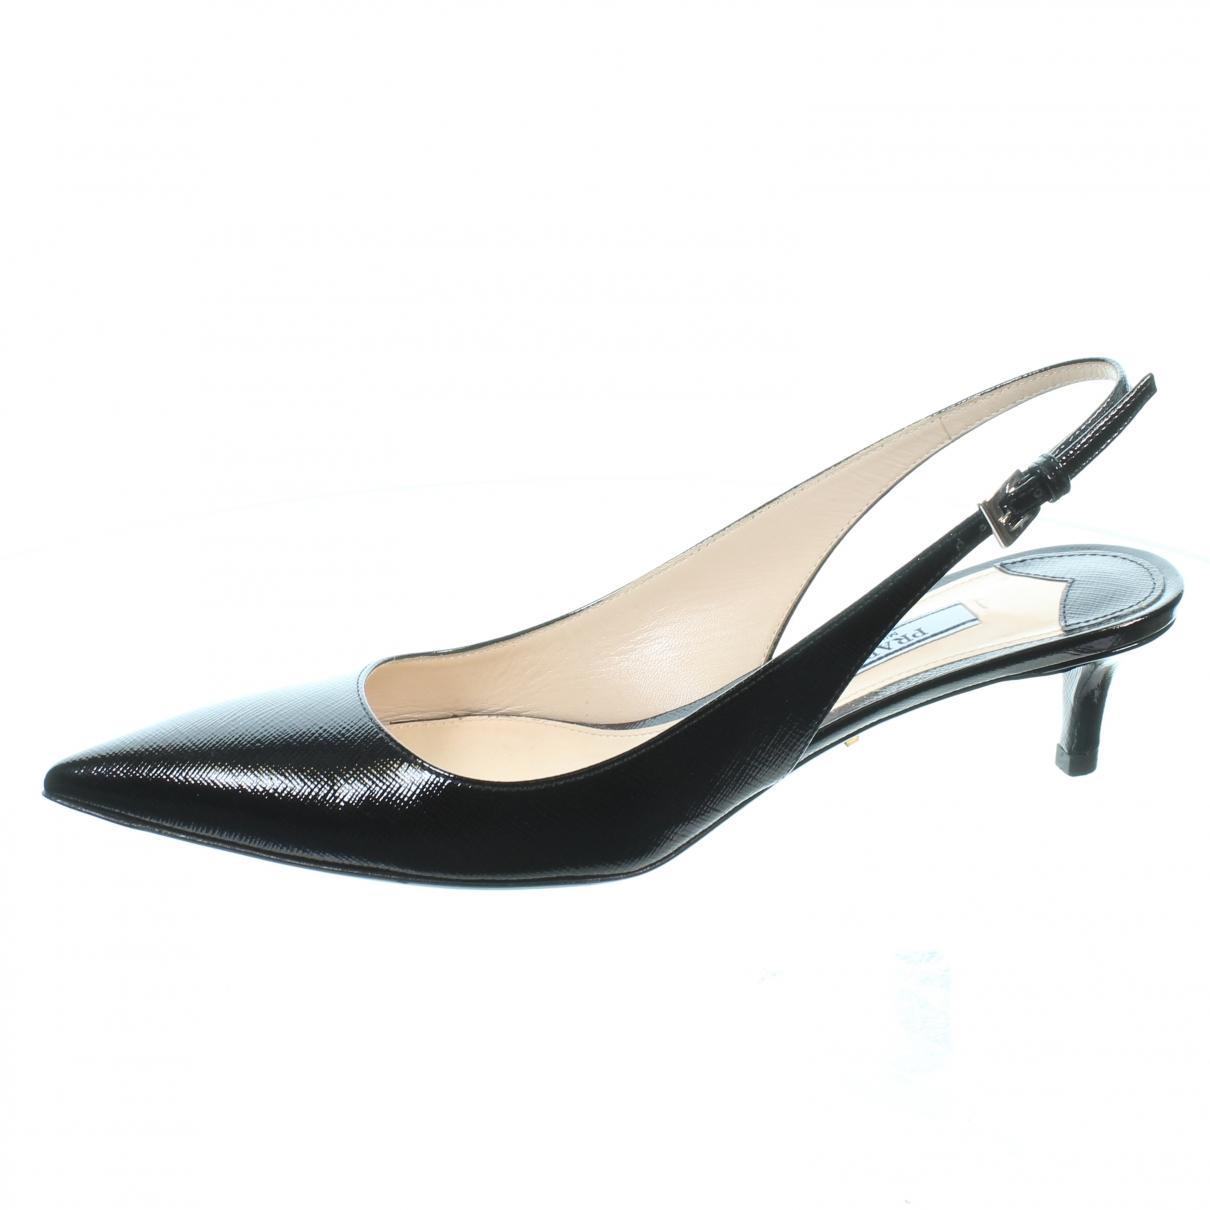 Prada \N Black Patent leather Heels for Women 35.5 EU